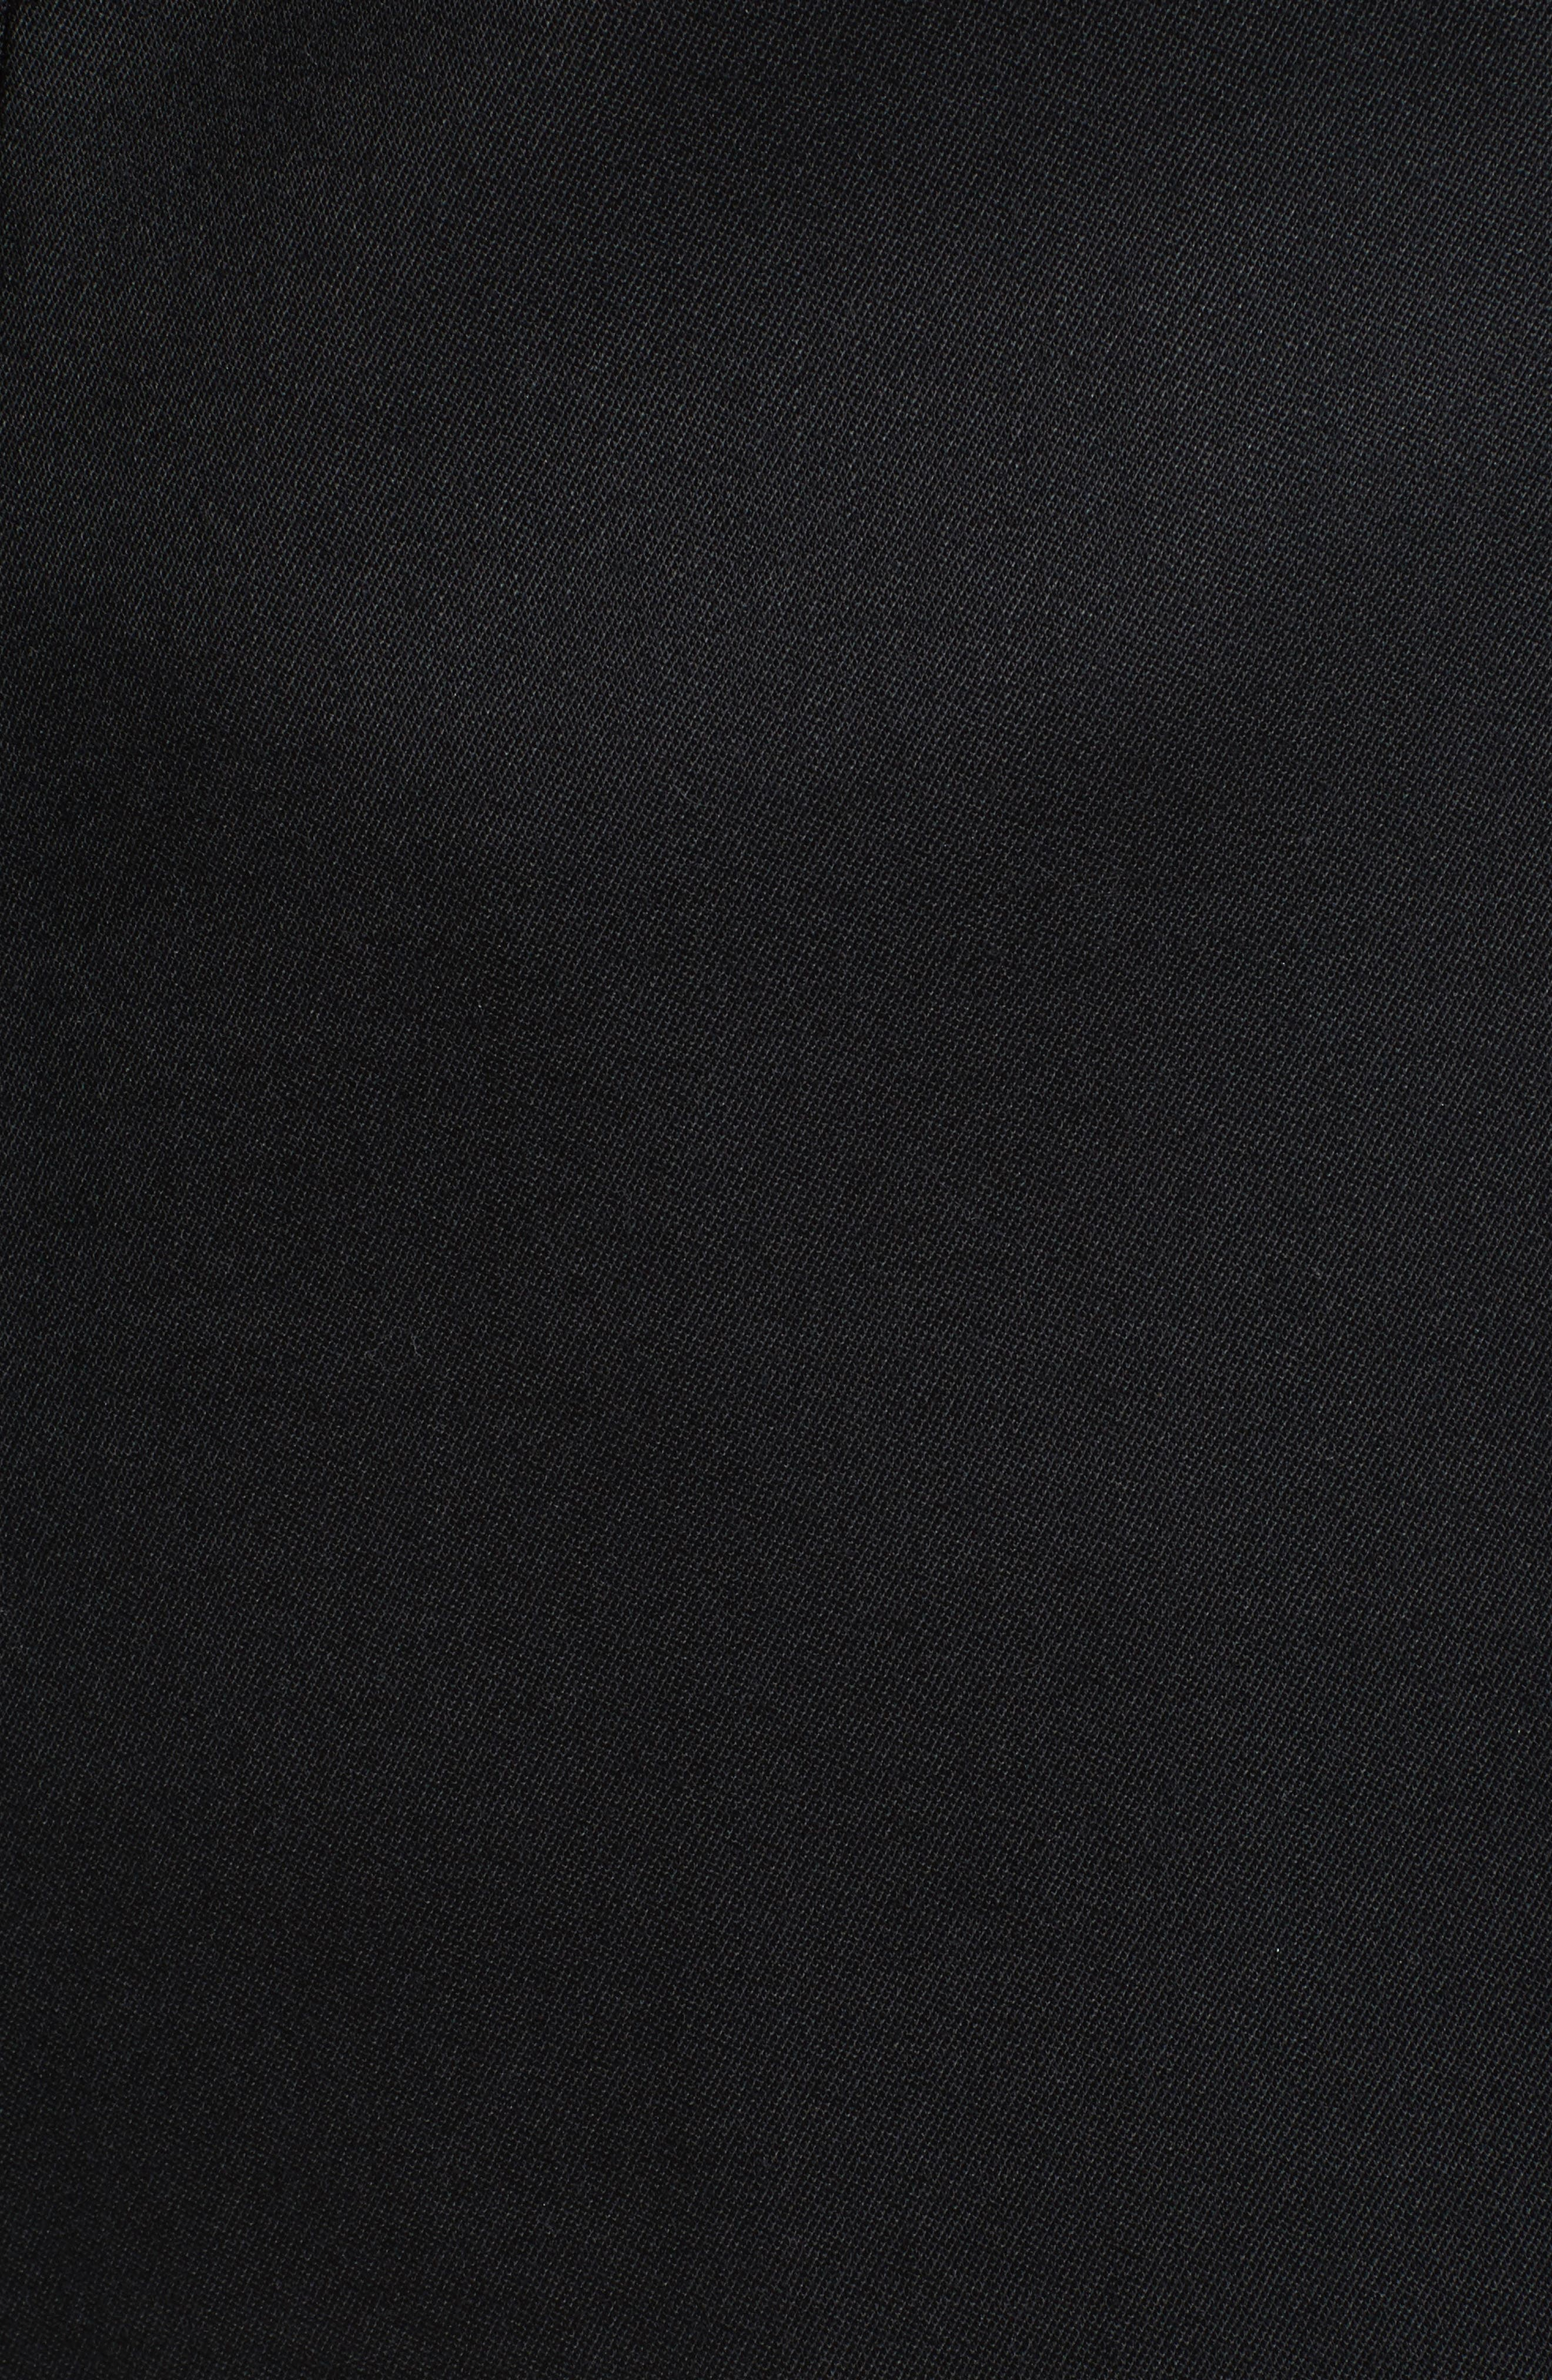 Wool Blend Tuxedo Jacket,                             Alternate thumbnail 5, color,                             Black